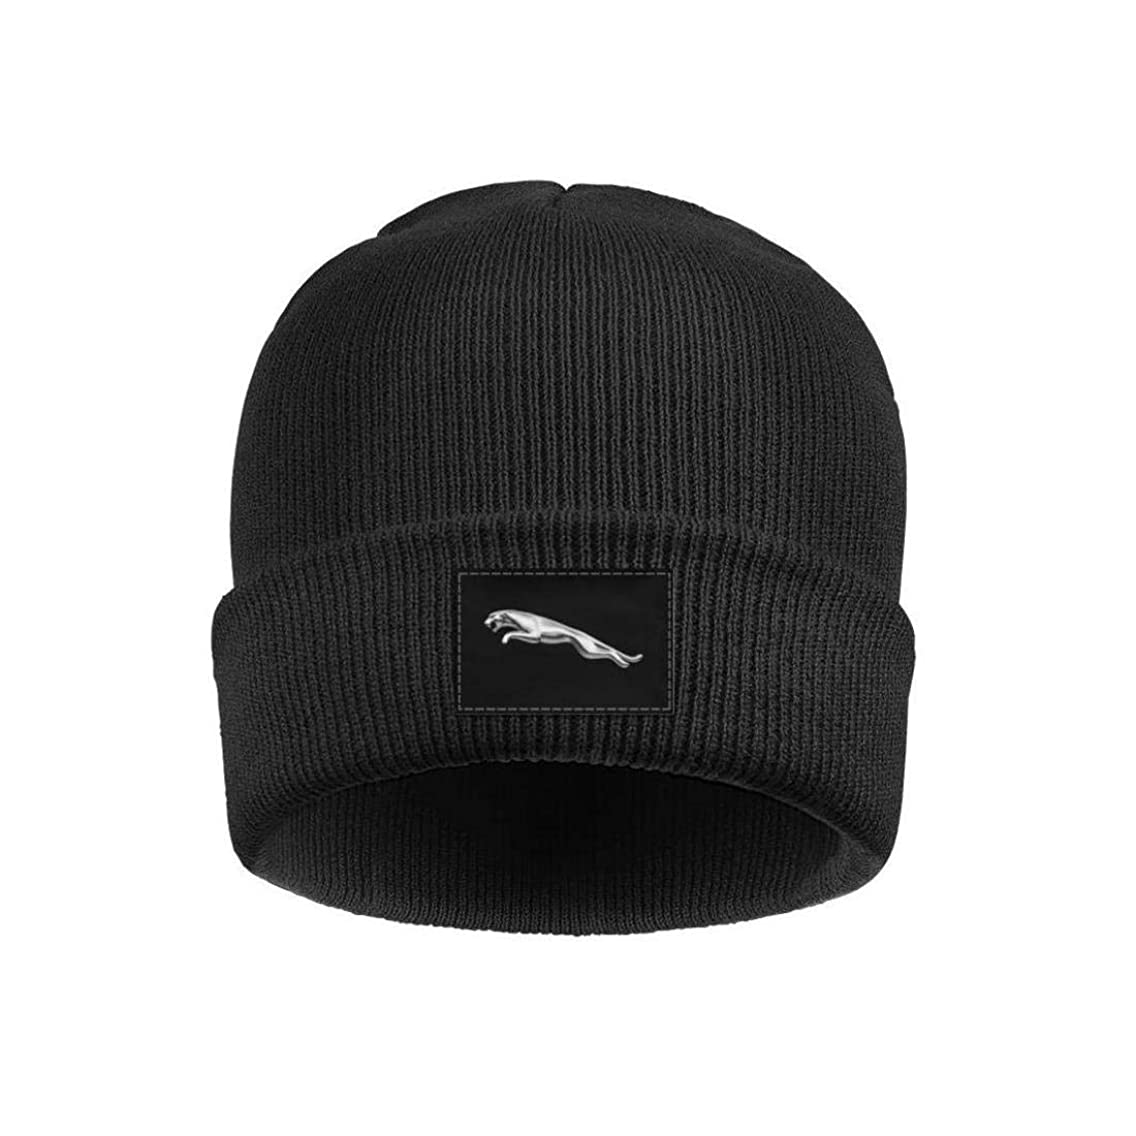 HOIOC Mens Womens Beanie Hats Soft FineAcrylic Winter Warm Jaguar-Logo- Fine Knit